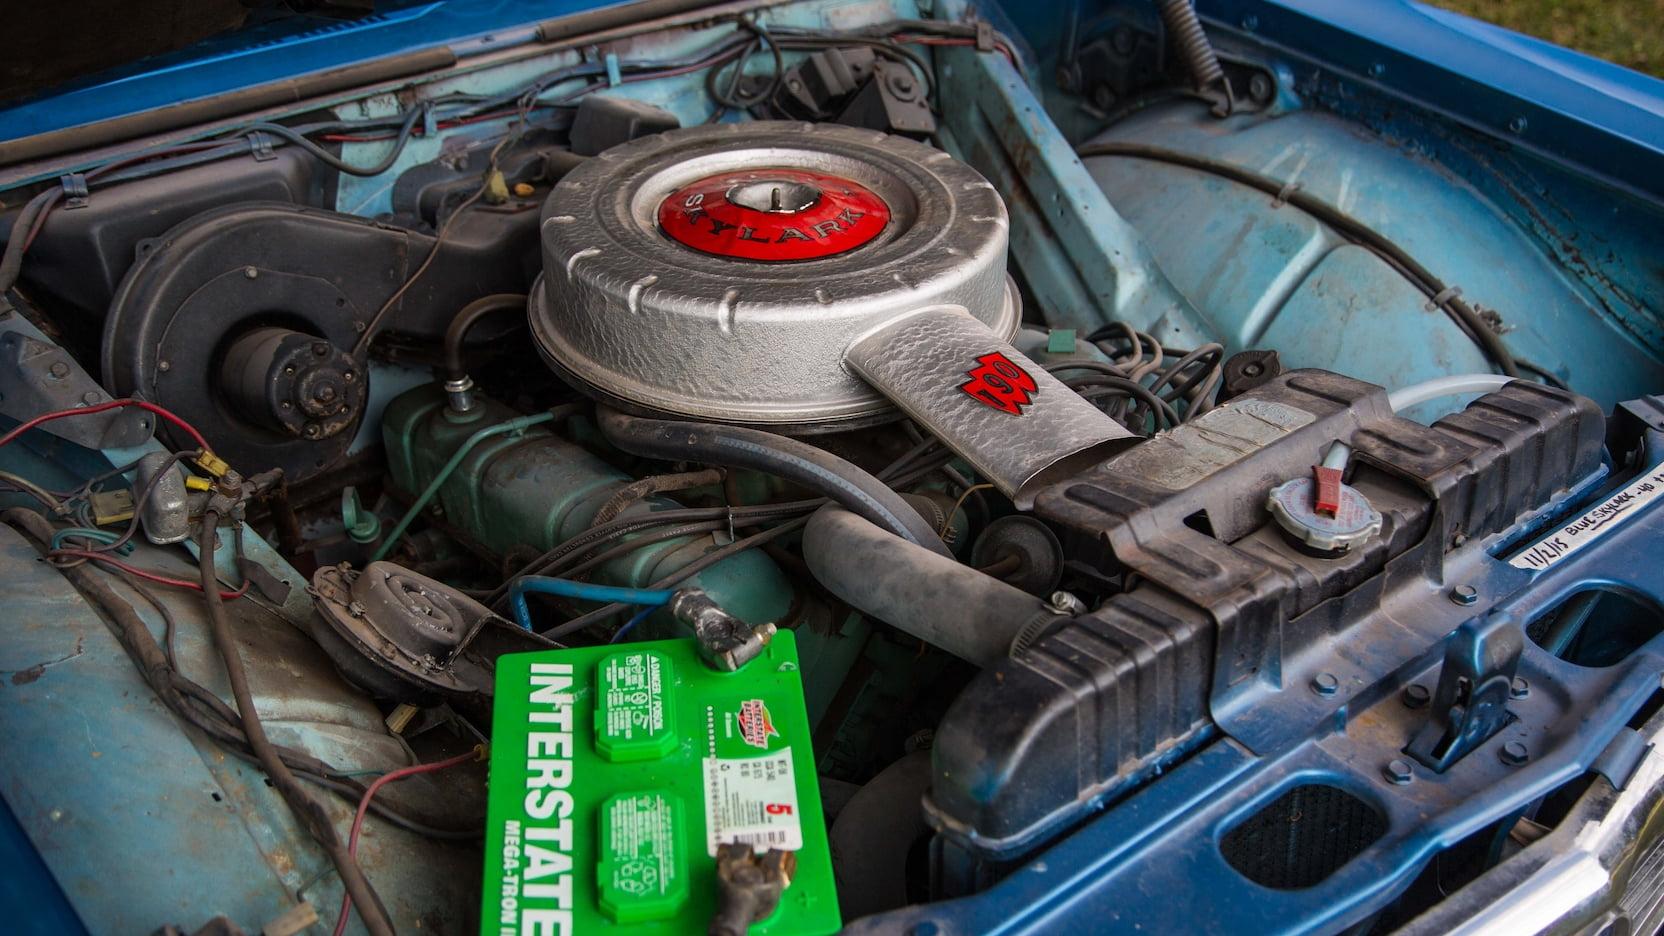 1962 Buick Skylark 215 engine